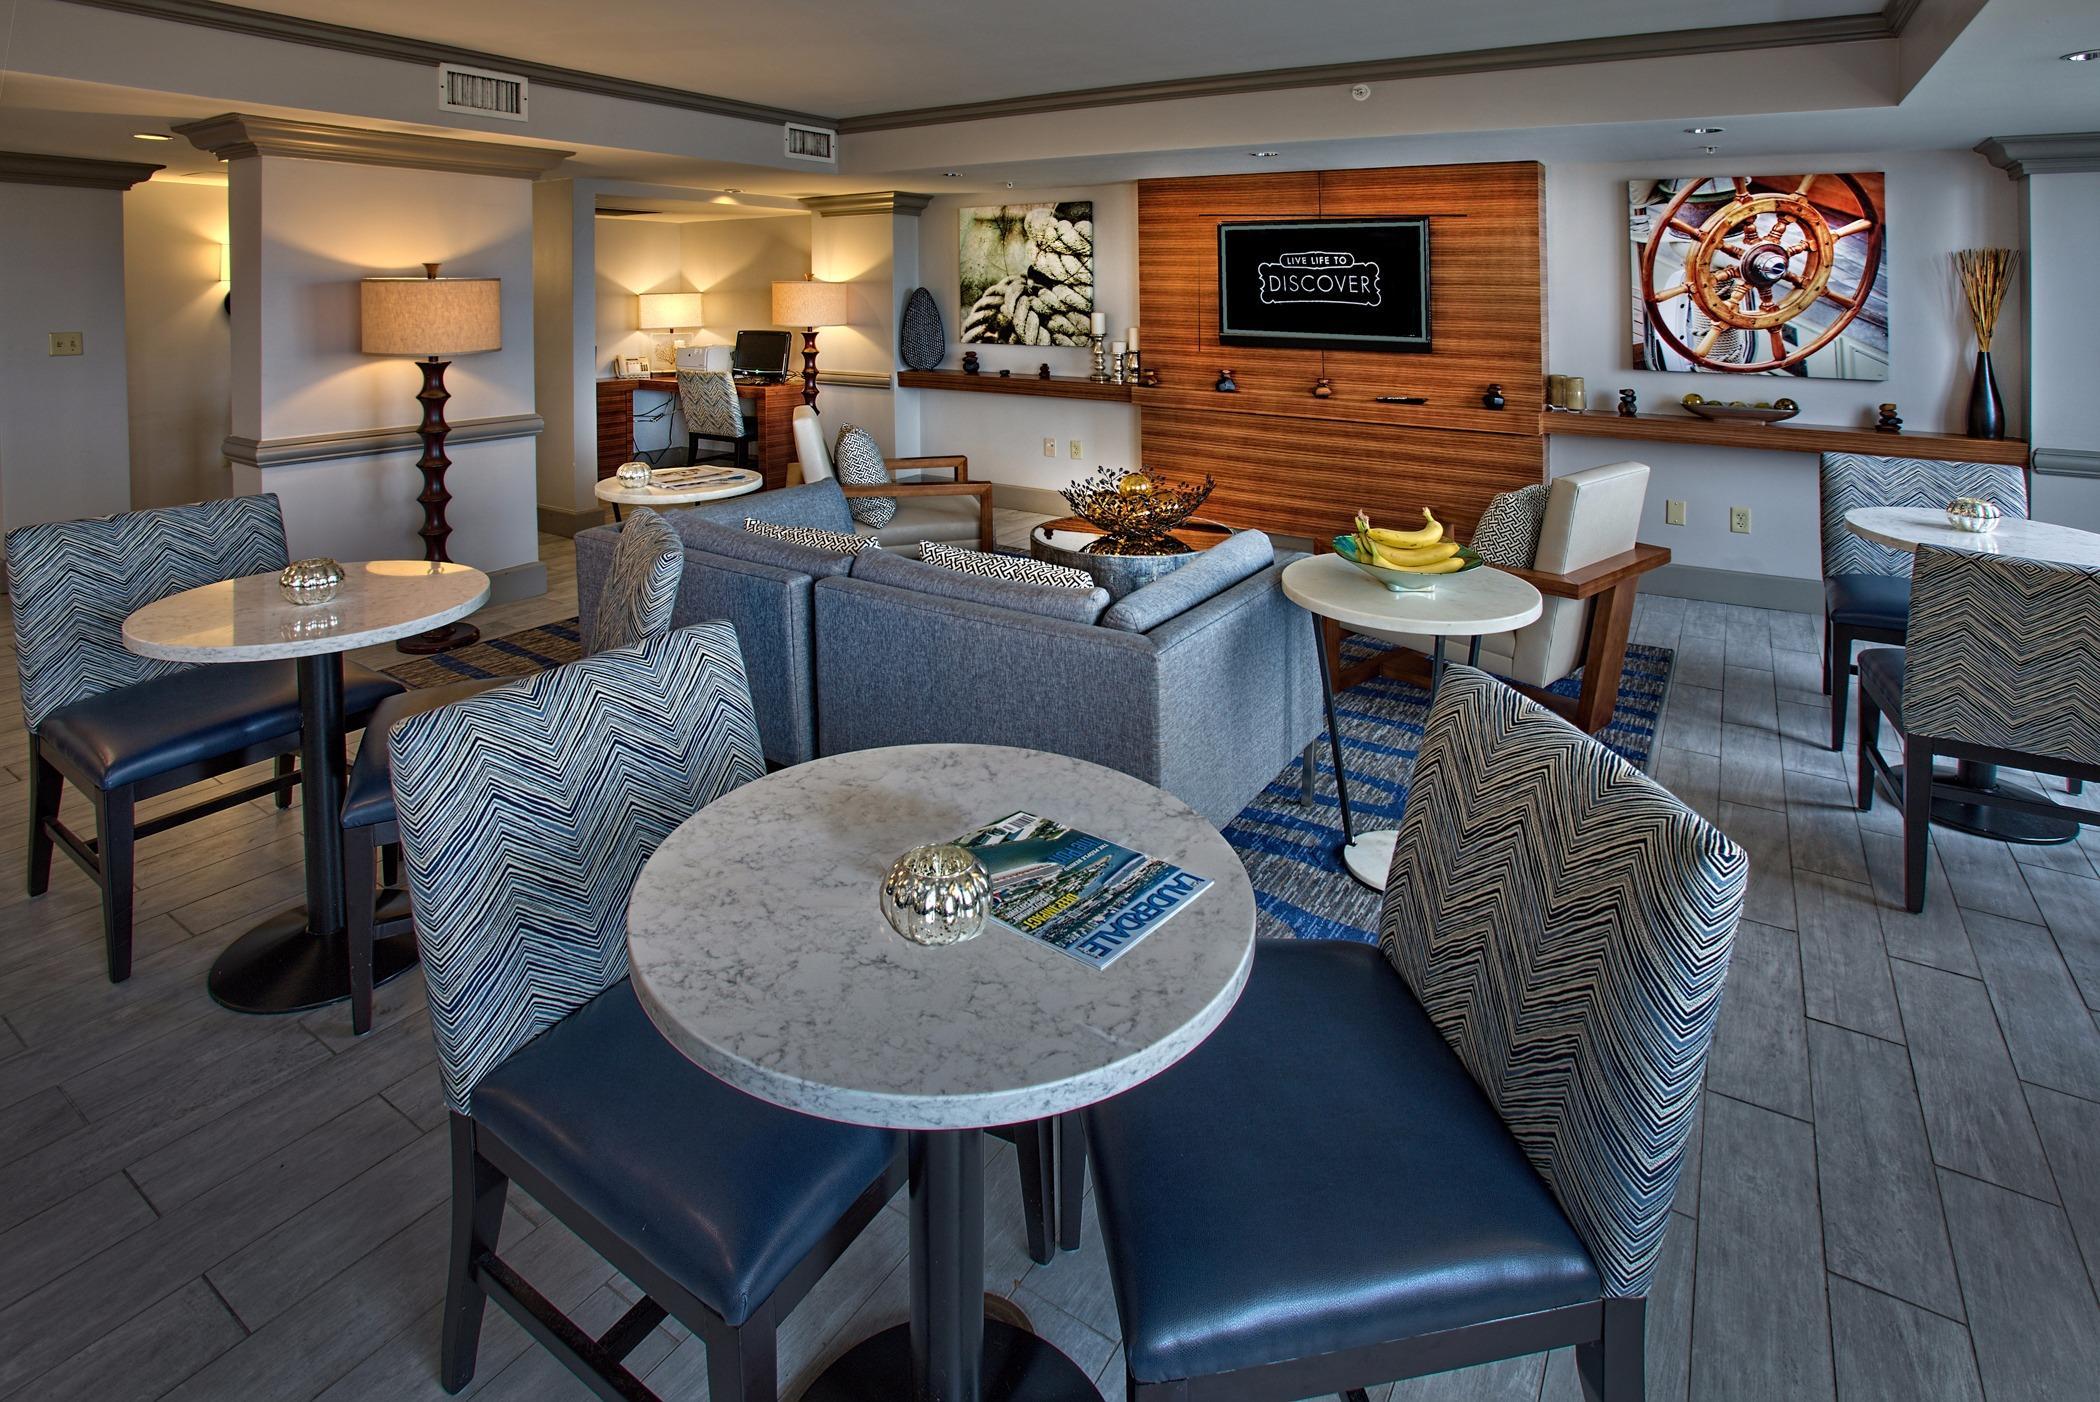 Renaissance Fort Lauderdale Cruise Port Hotel image 13